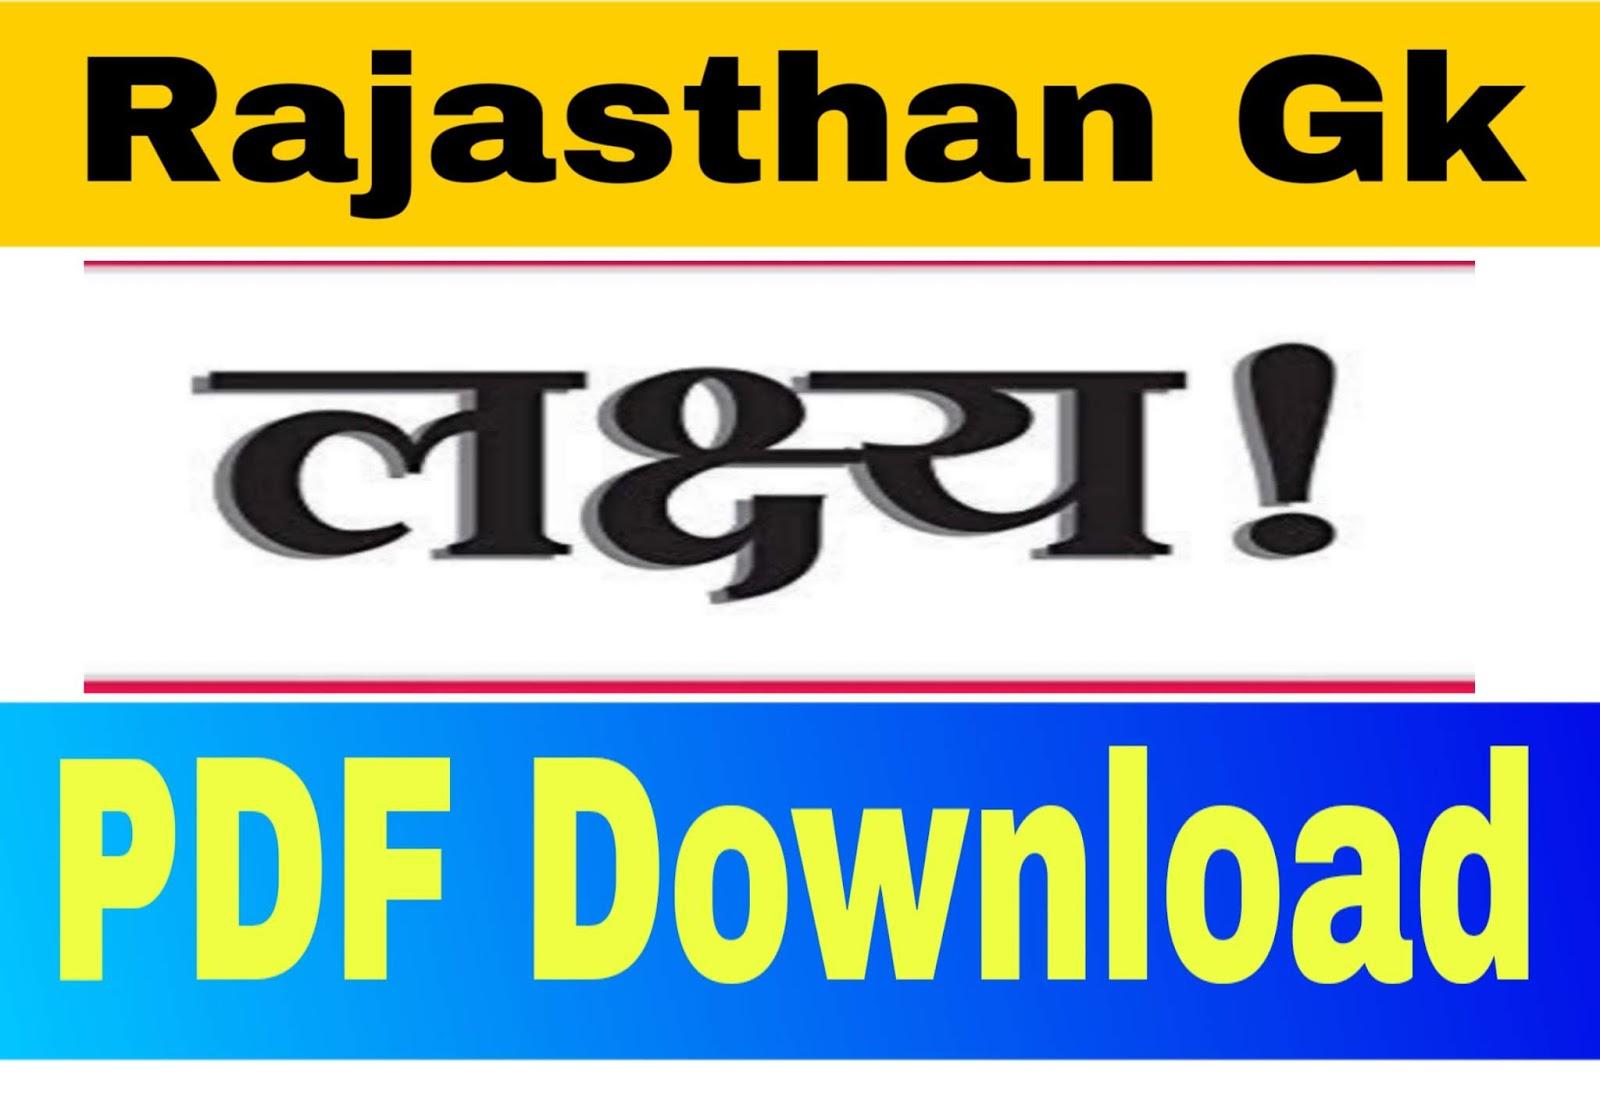 Rajasthan GK Lakshya book pdf download link   Rajasthan GK